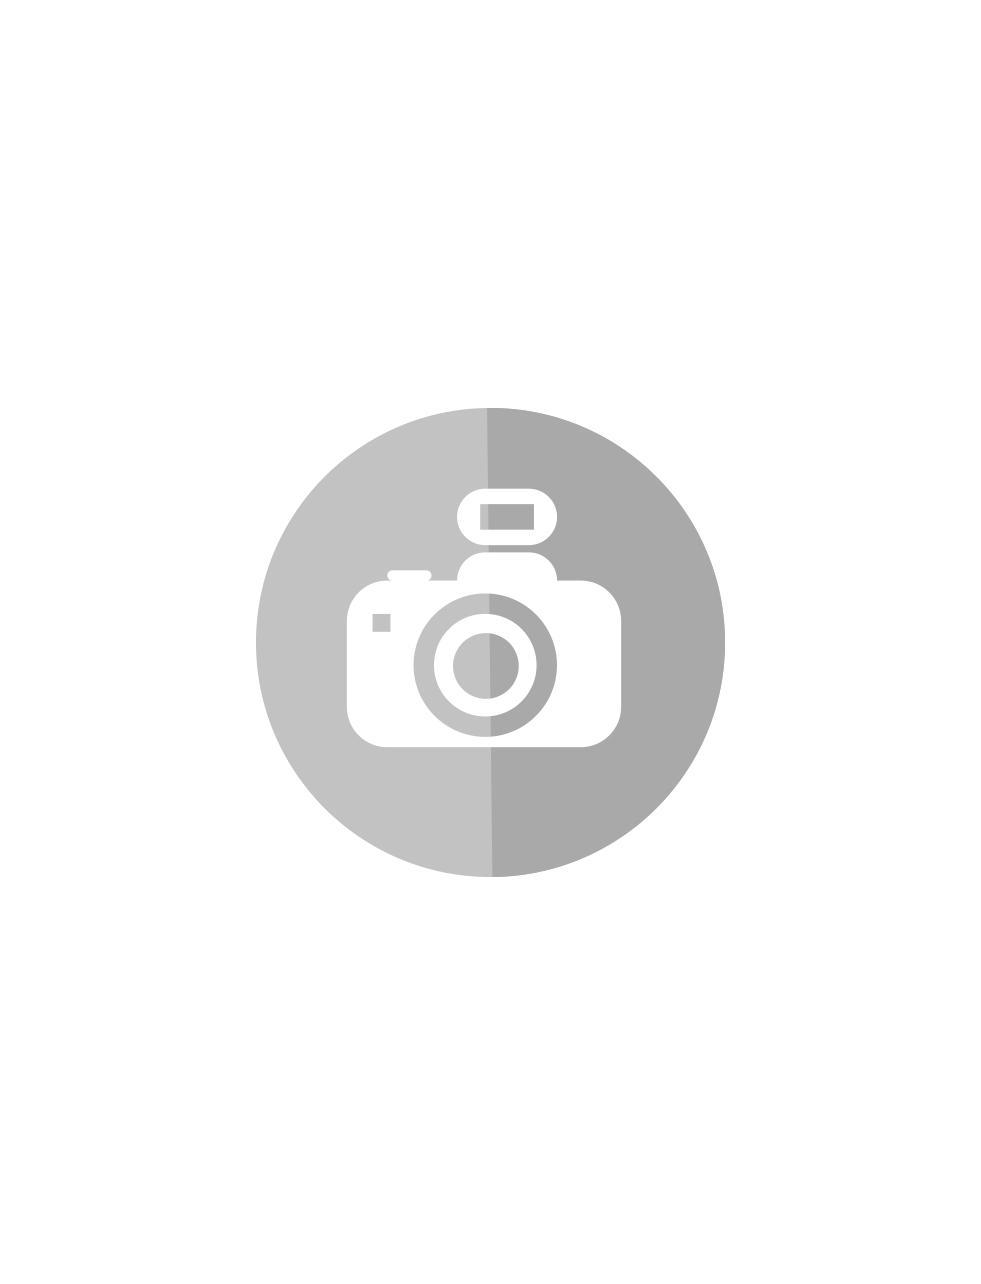 30035990_sparepart/Bs-Sitzschale